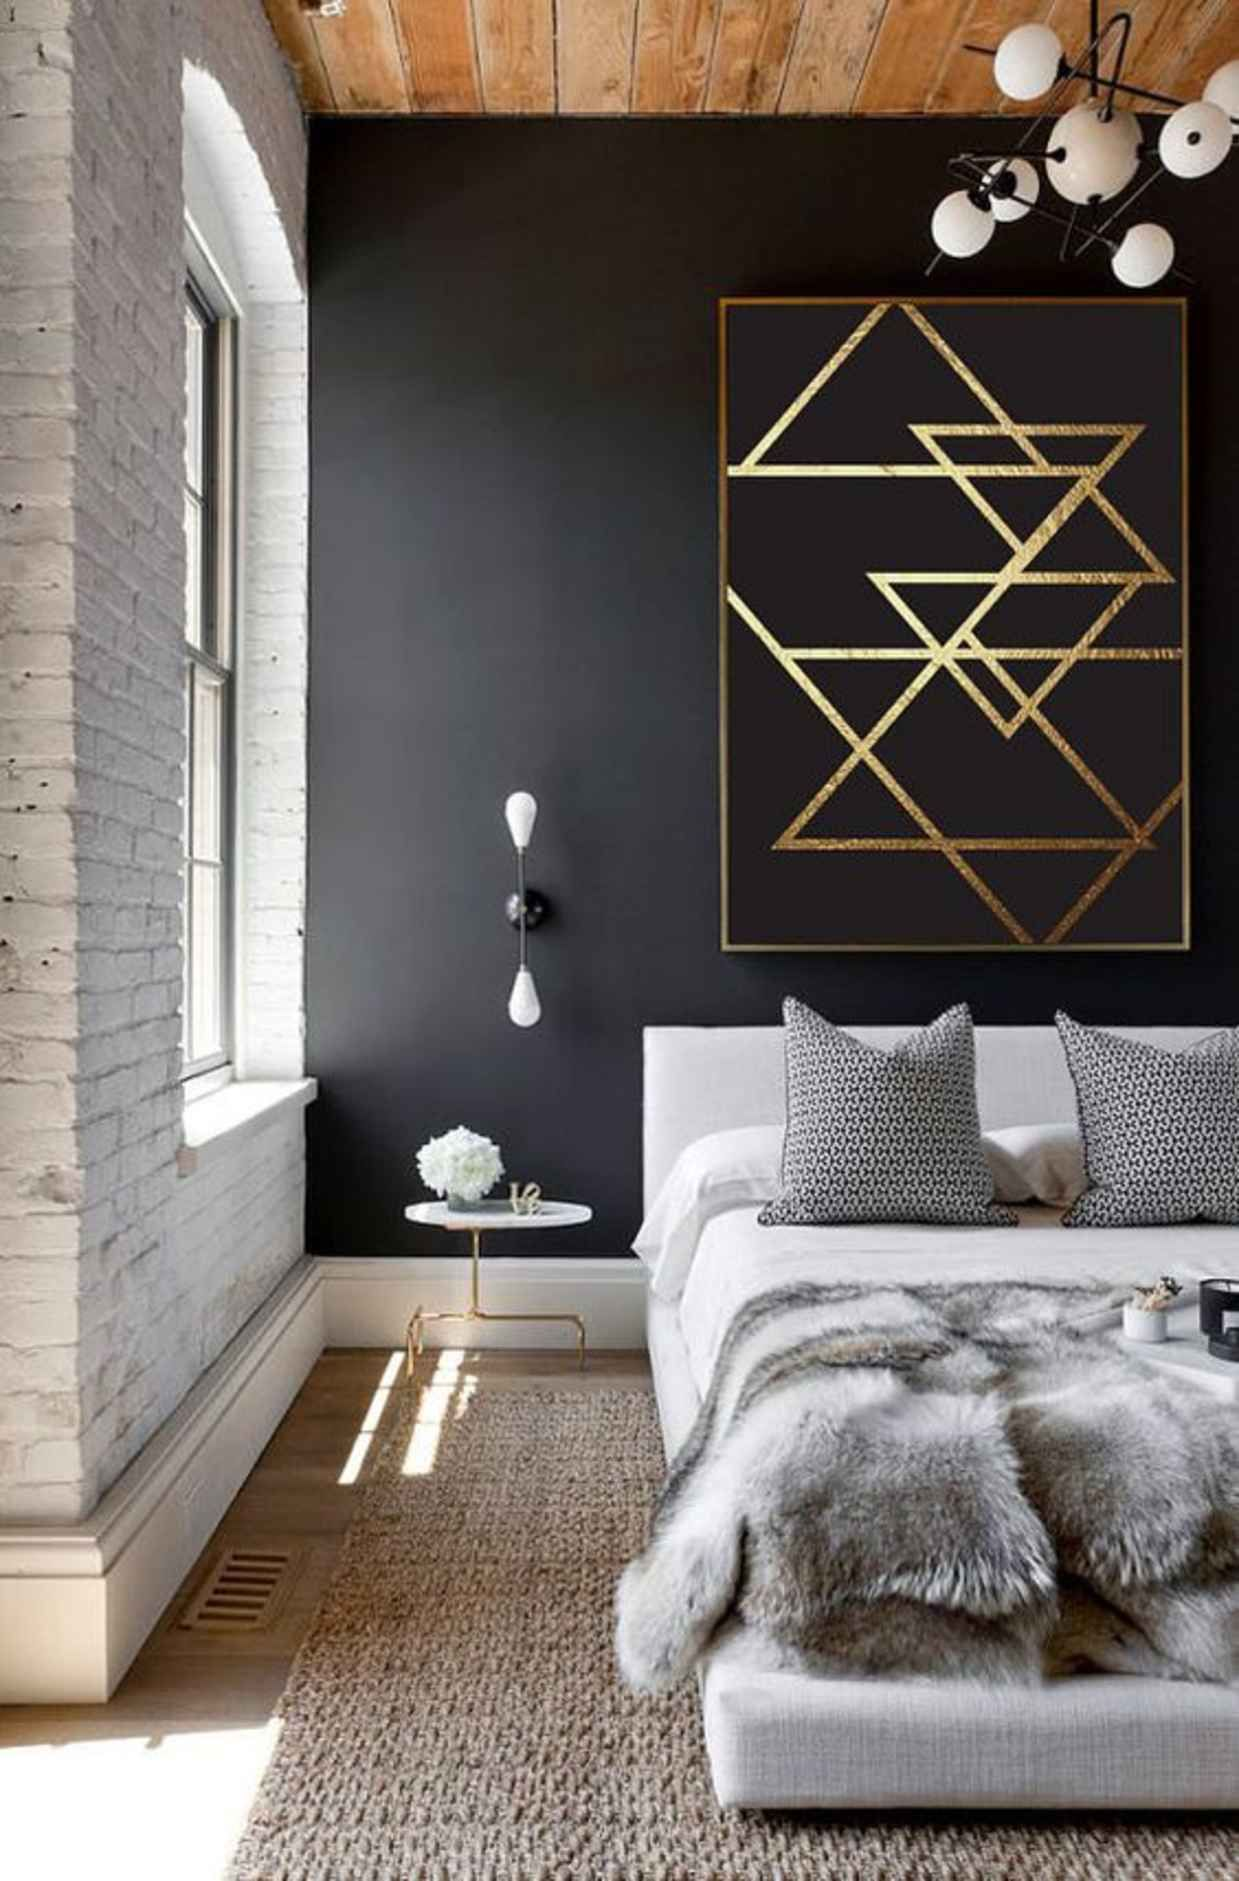 Bedroom interior wall decoration  examples of minimal interior design   pinterest  minimal